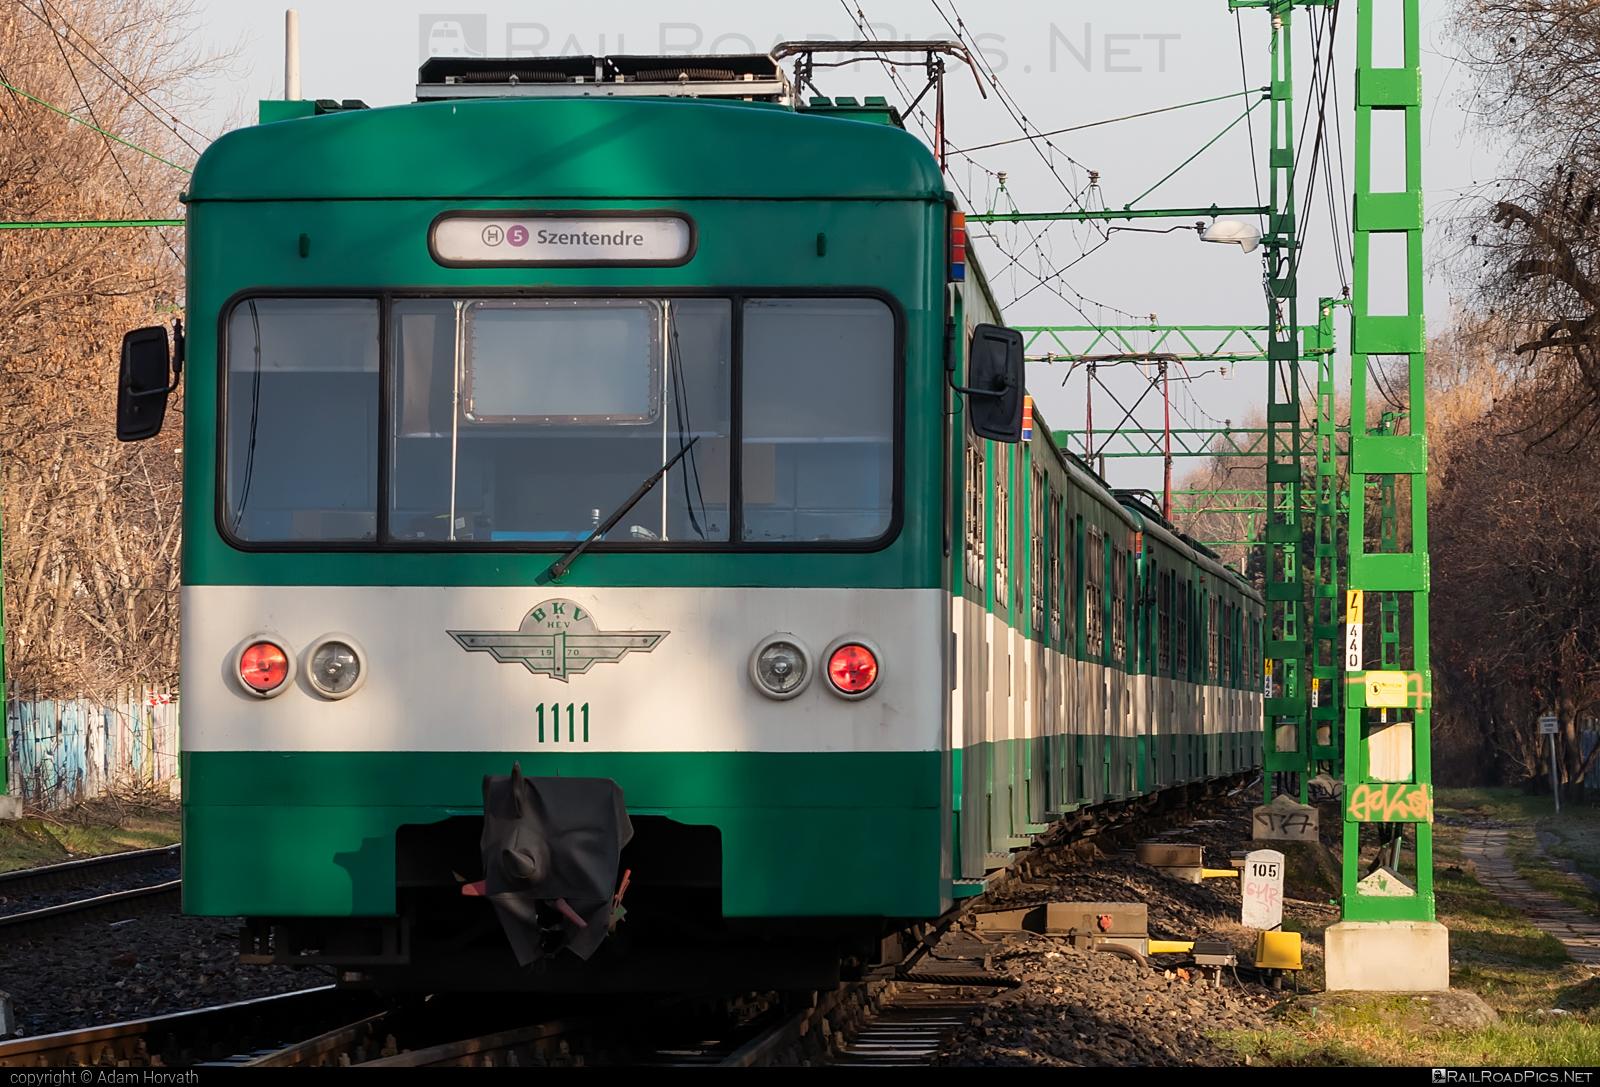 LEW Hennigsdorf MXa - 1111 operated by Budapesti Helyi Érdekü Vasút #BudapestiHelyiErdekuVasut #bhev #hansbeimler #lewhennigsdorf #lewmxa